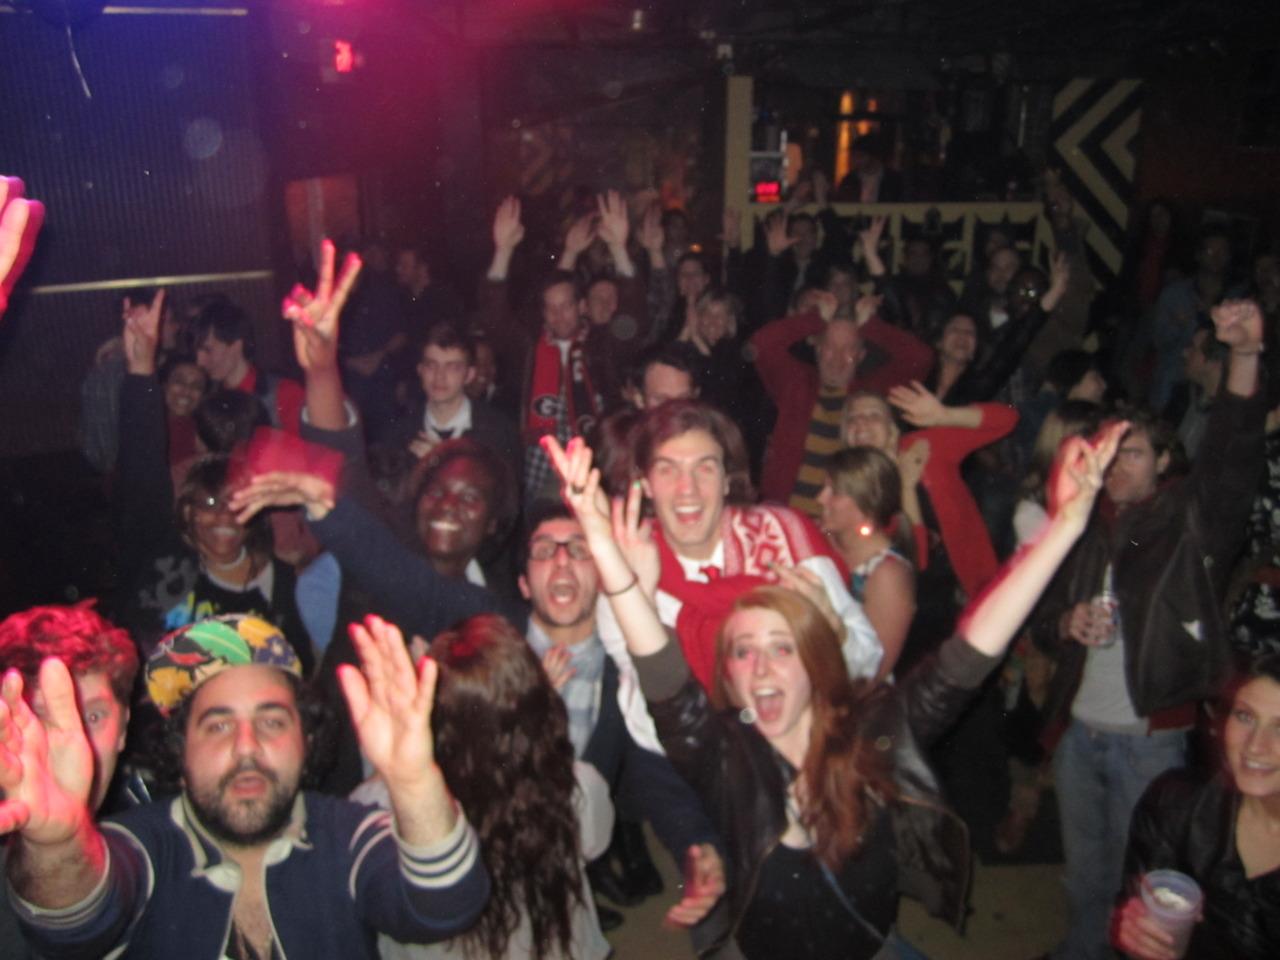 Audience, The Drunken Unicorn. Atlanta, GA